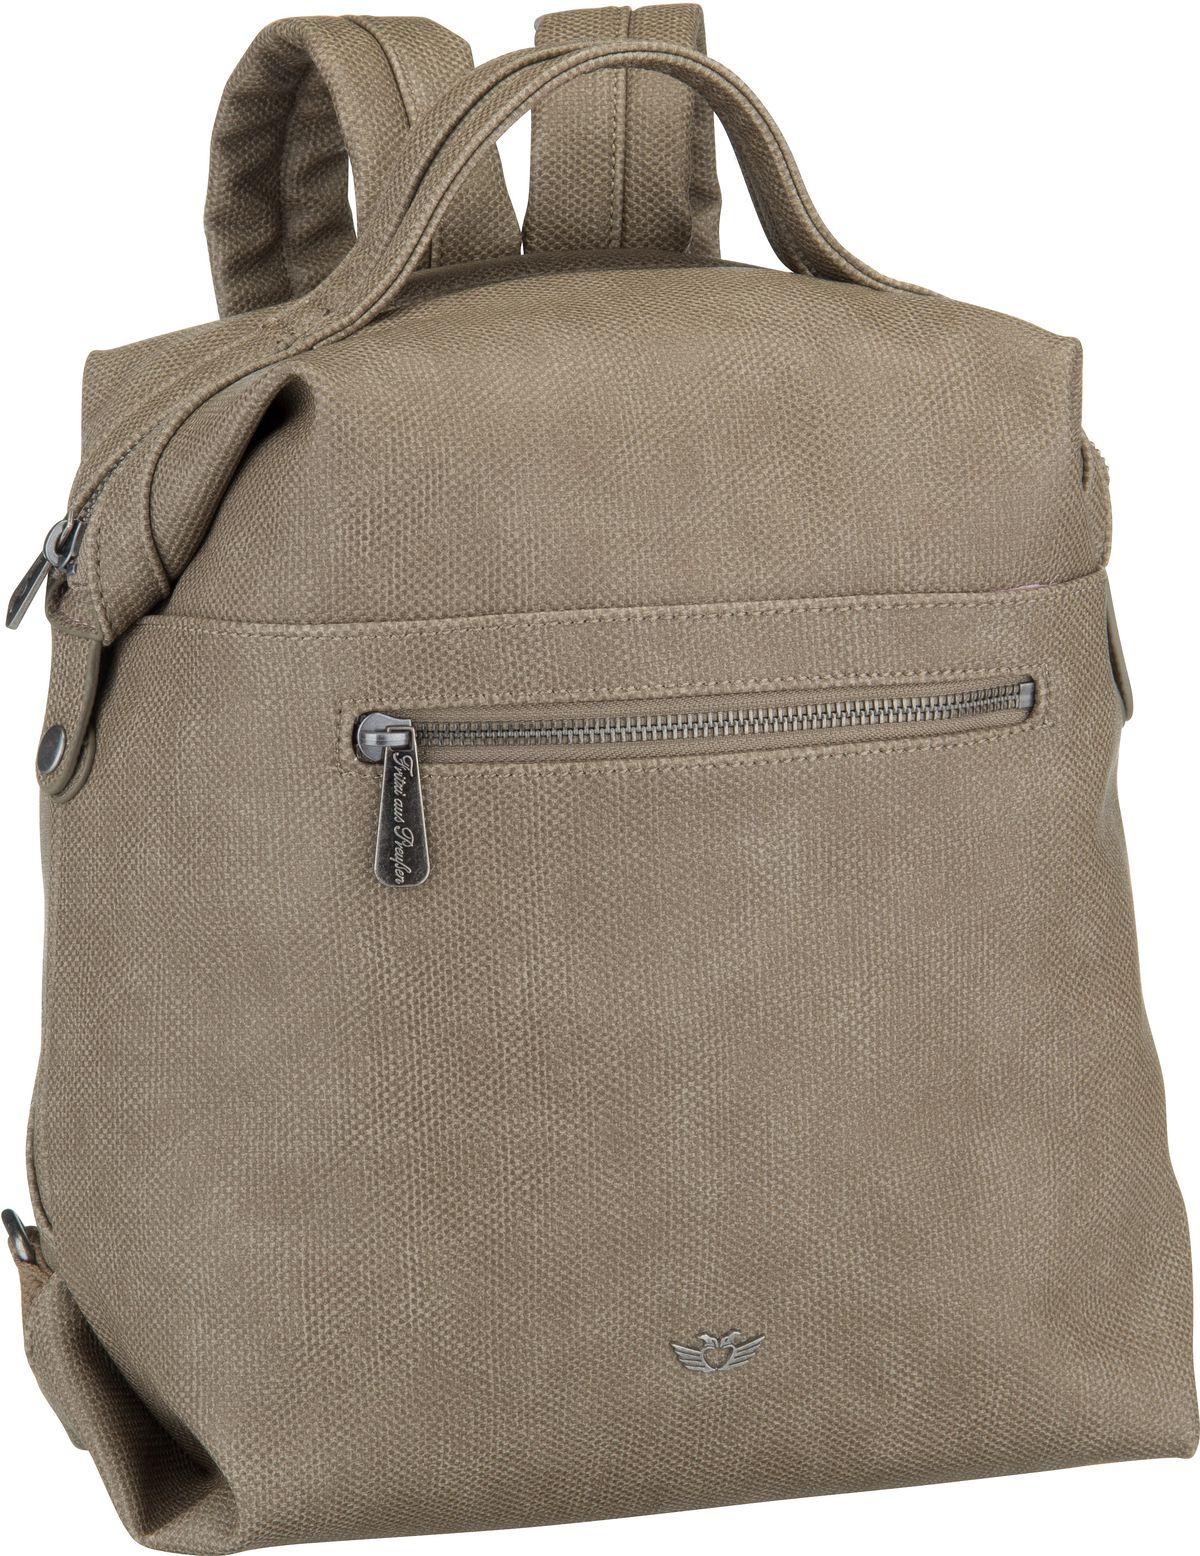 Rucksack / Daypack Harper Mini Pixley Mud